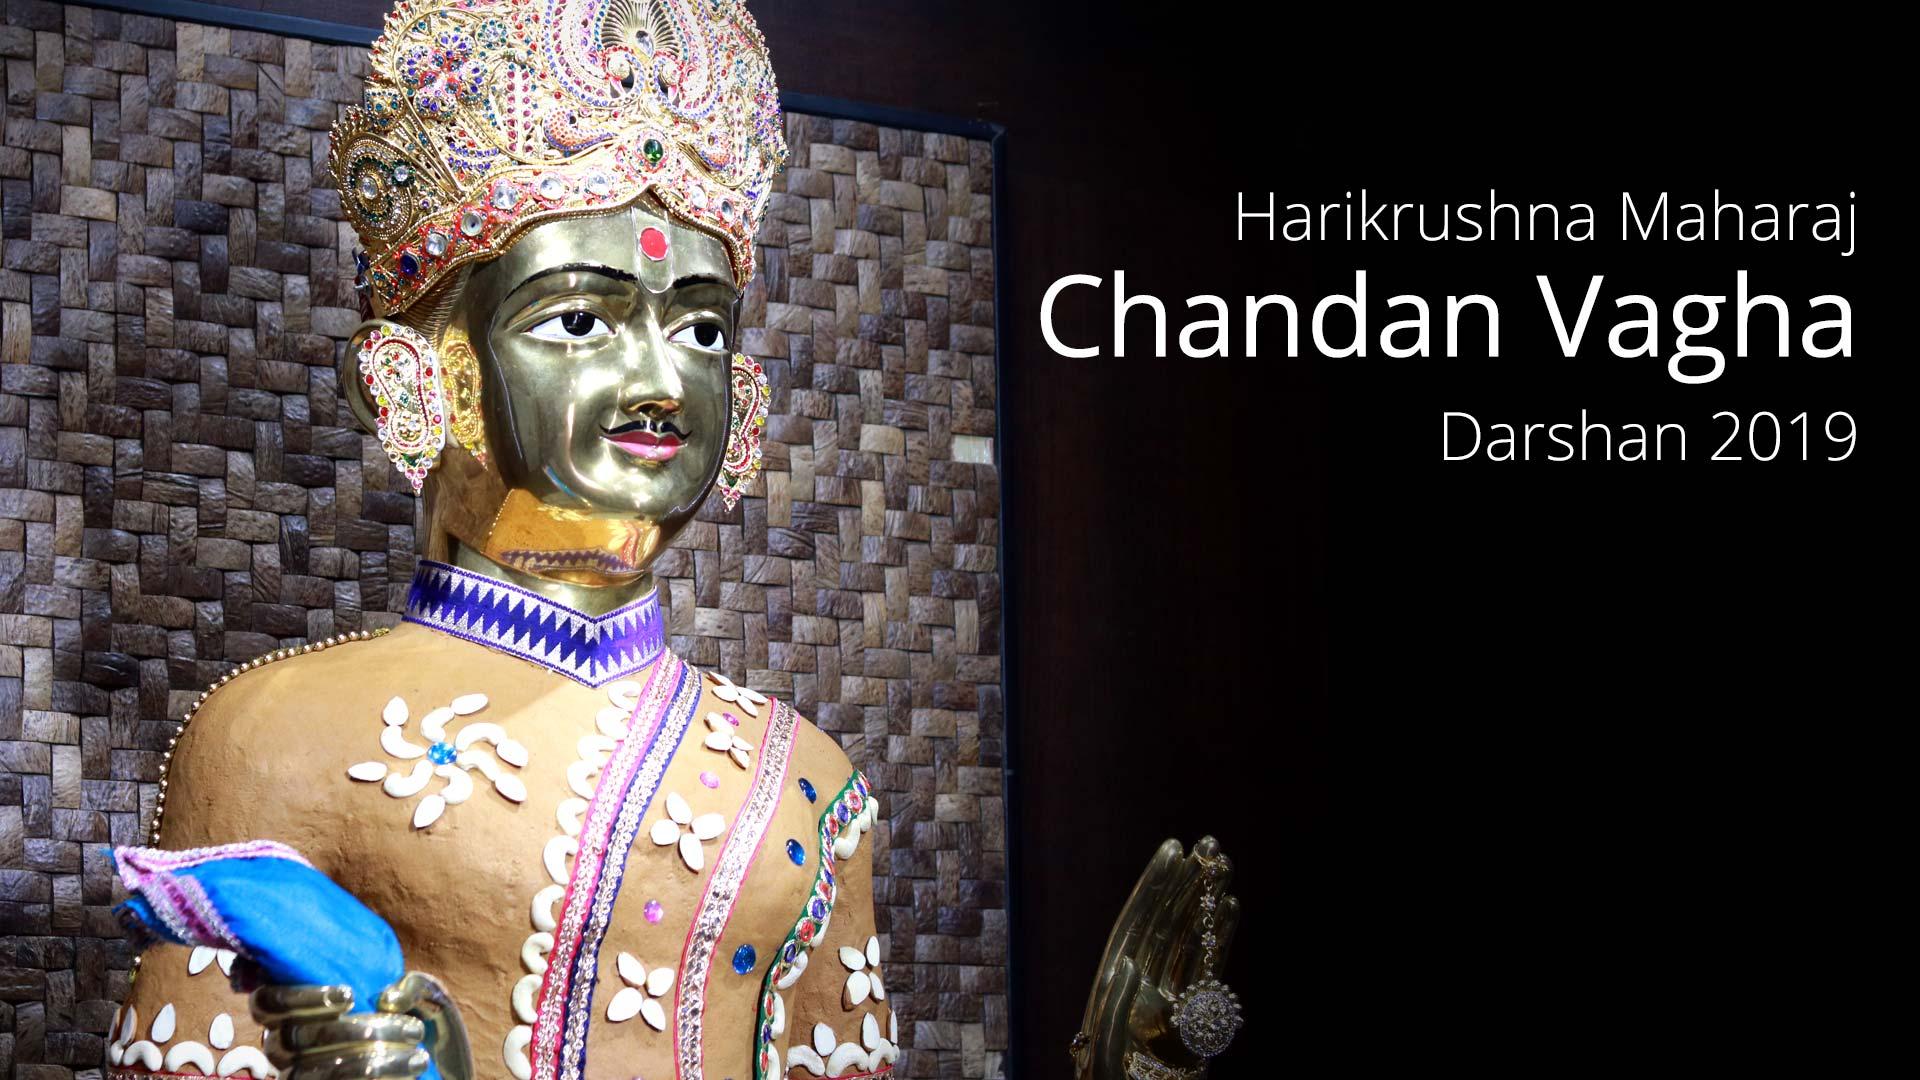 Harikrushna Maharaj Chandan Vagha Darshan - 2019